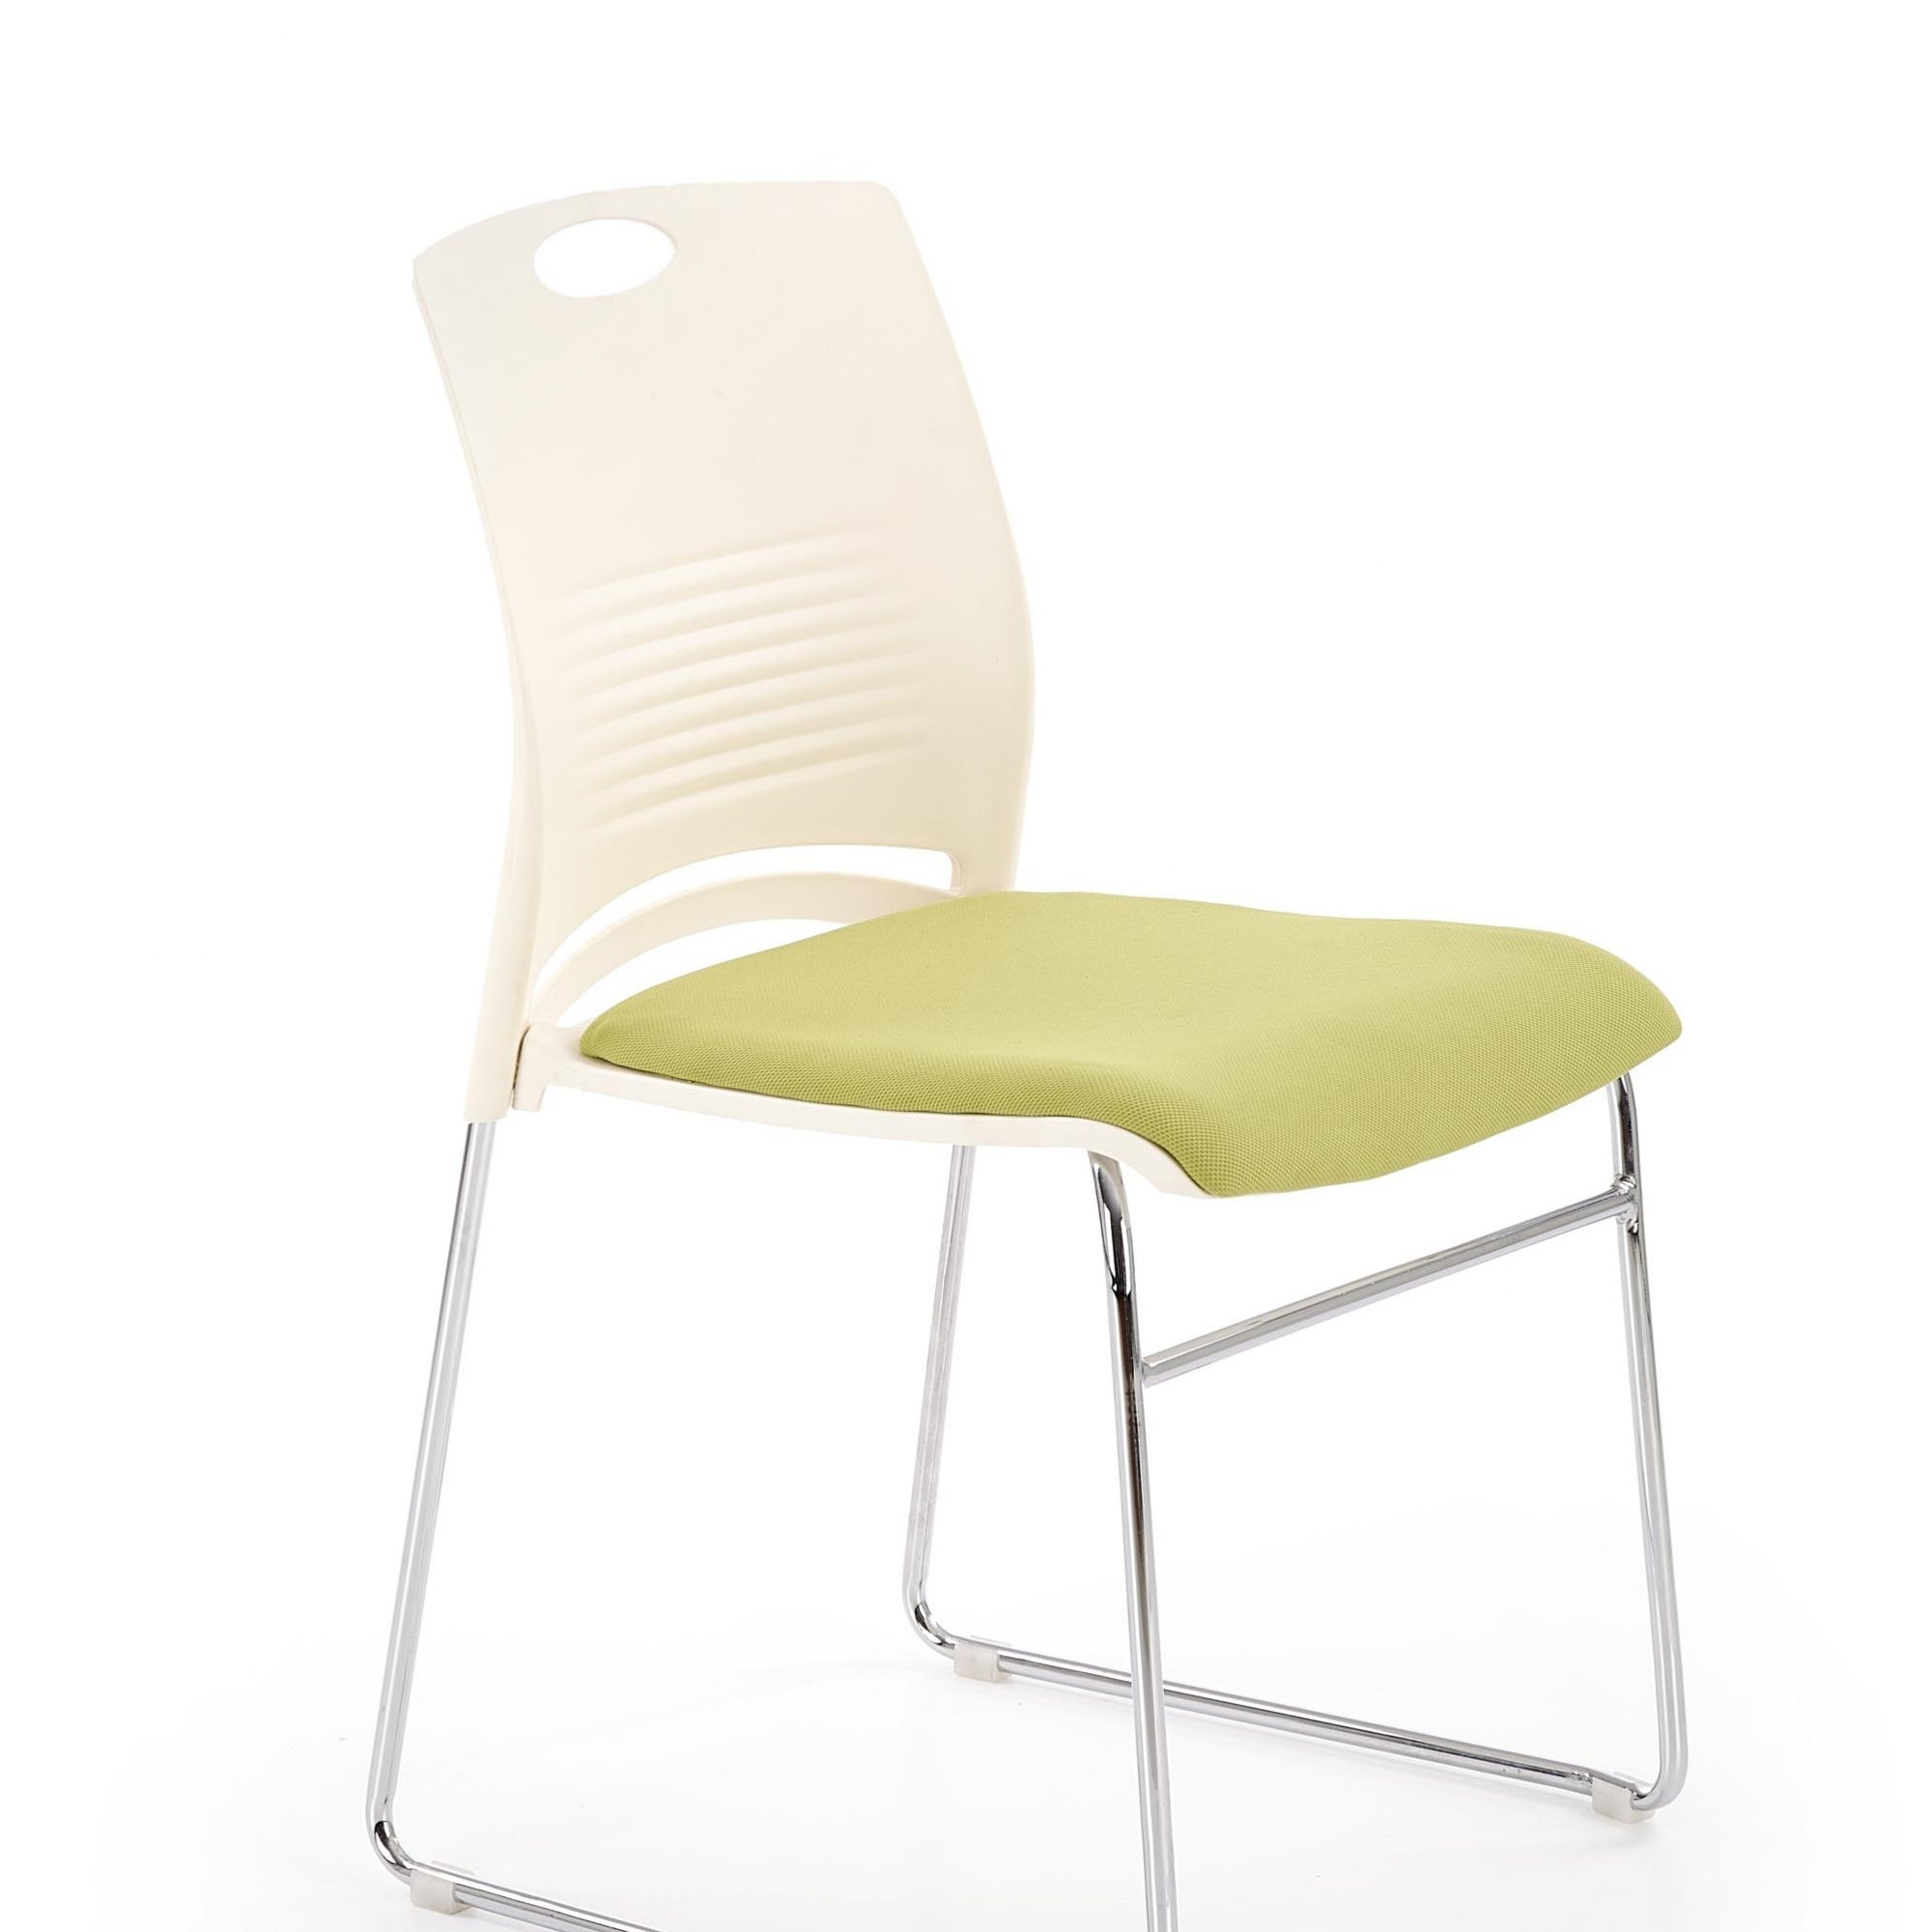 Scaun din plastic, cu sezut tapitat cu stofa si picioare metalice Calis Alb / Verde, l44xA52xH80 cm